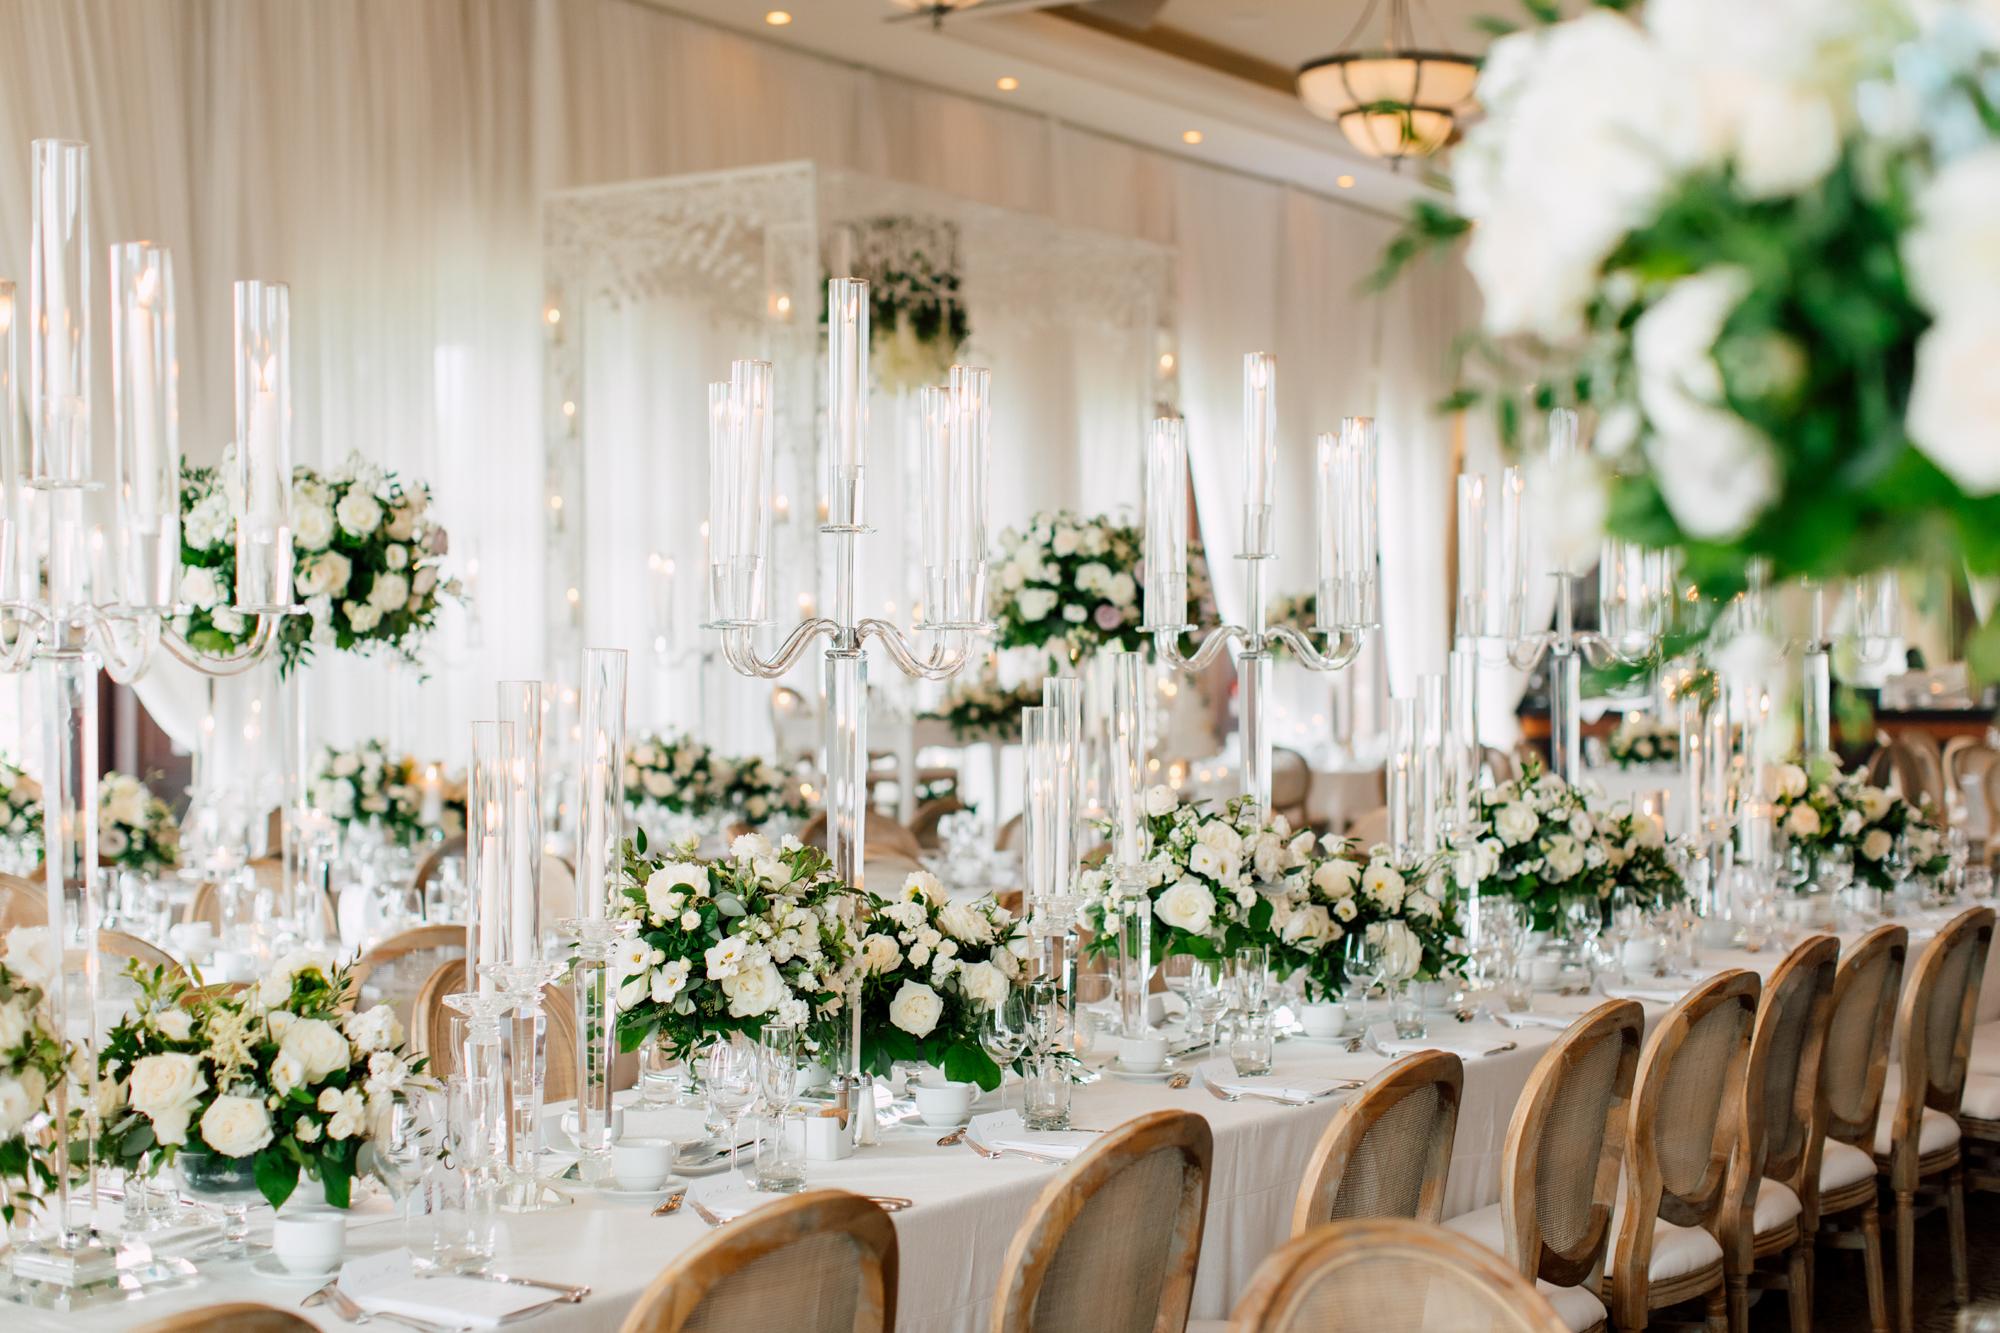 shealyn angus wedding decor